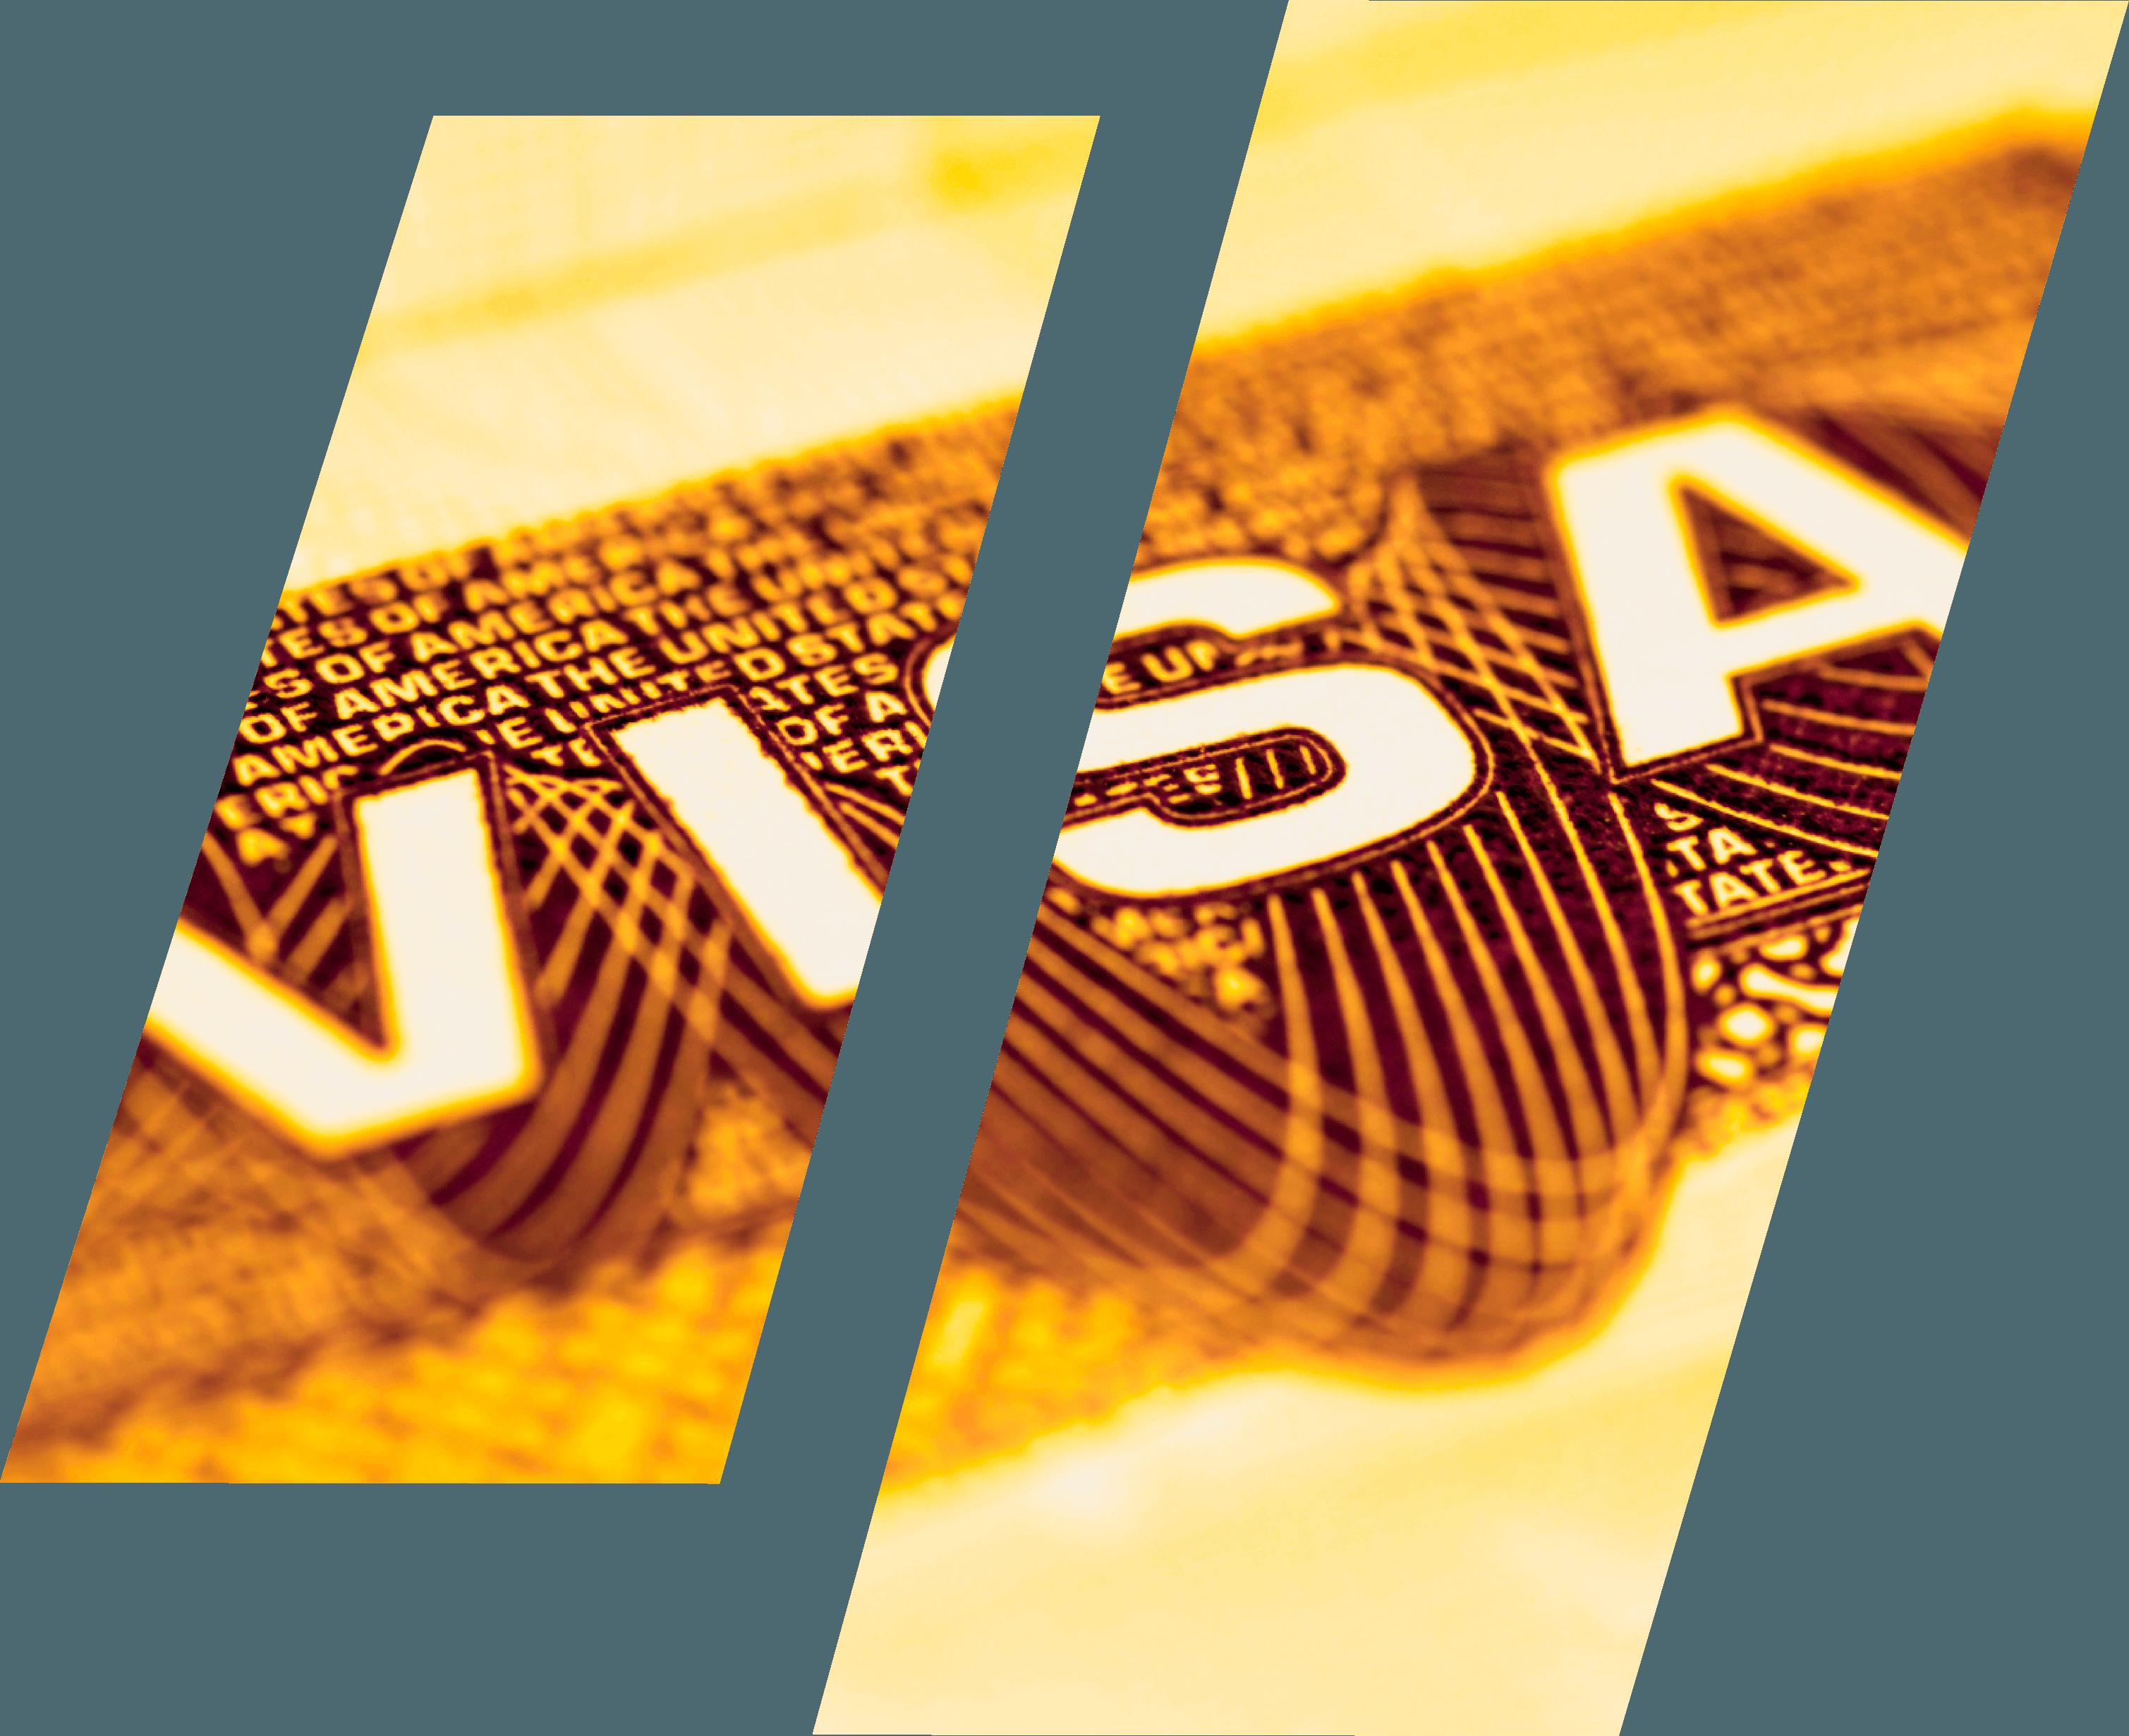 golden visa Portugal easy nationality